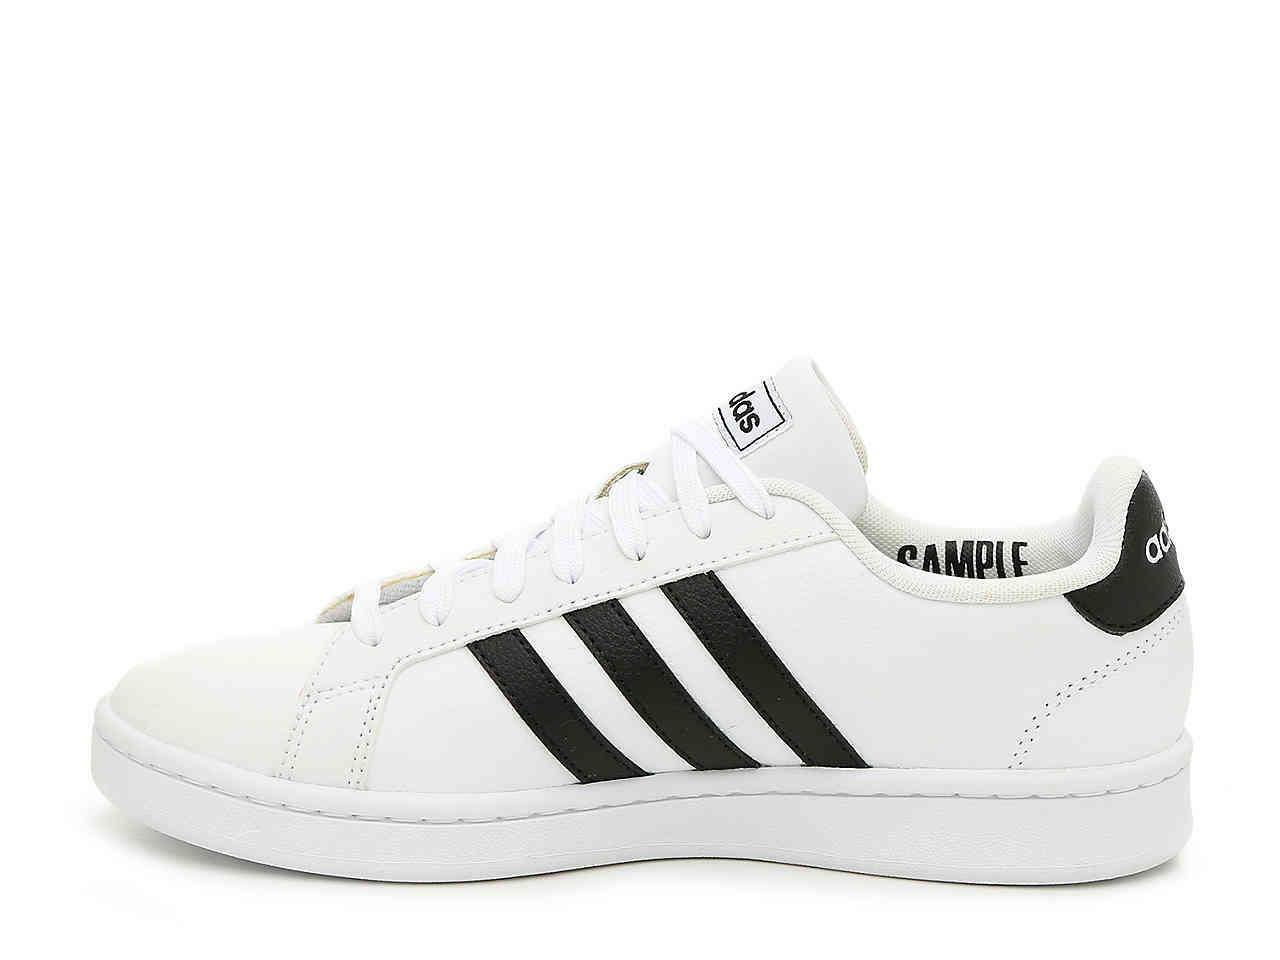 adidas adidas grand court uomo sneaker sportiva  f36392 bianco